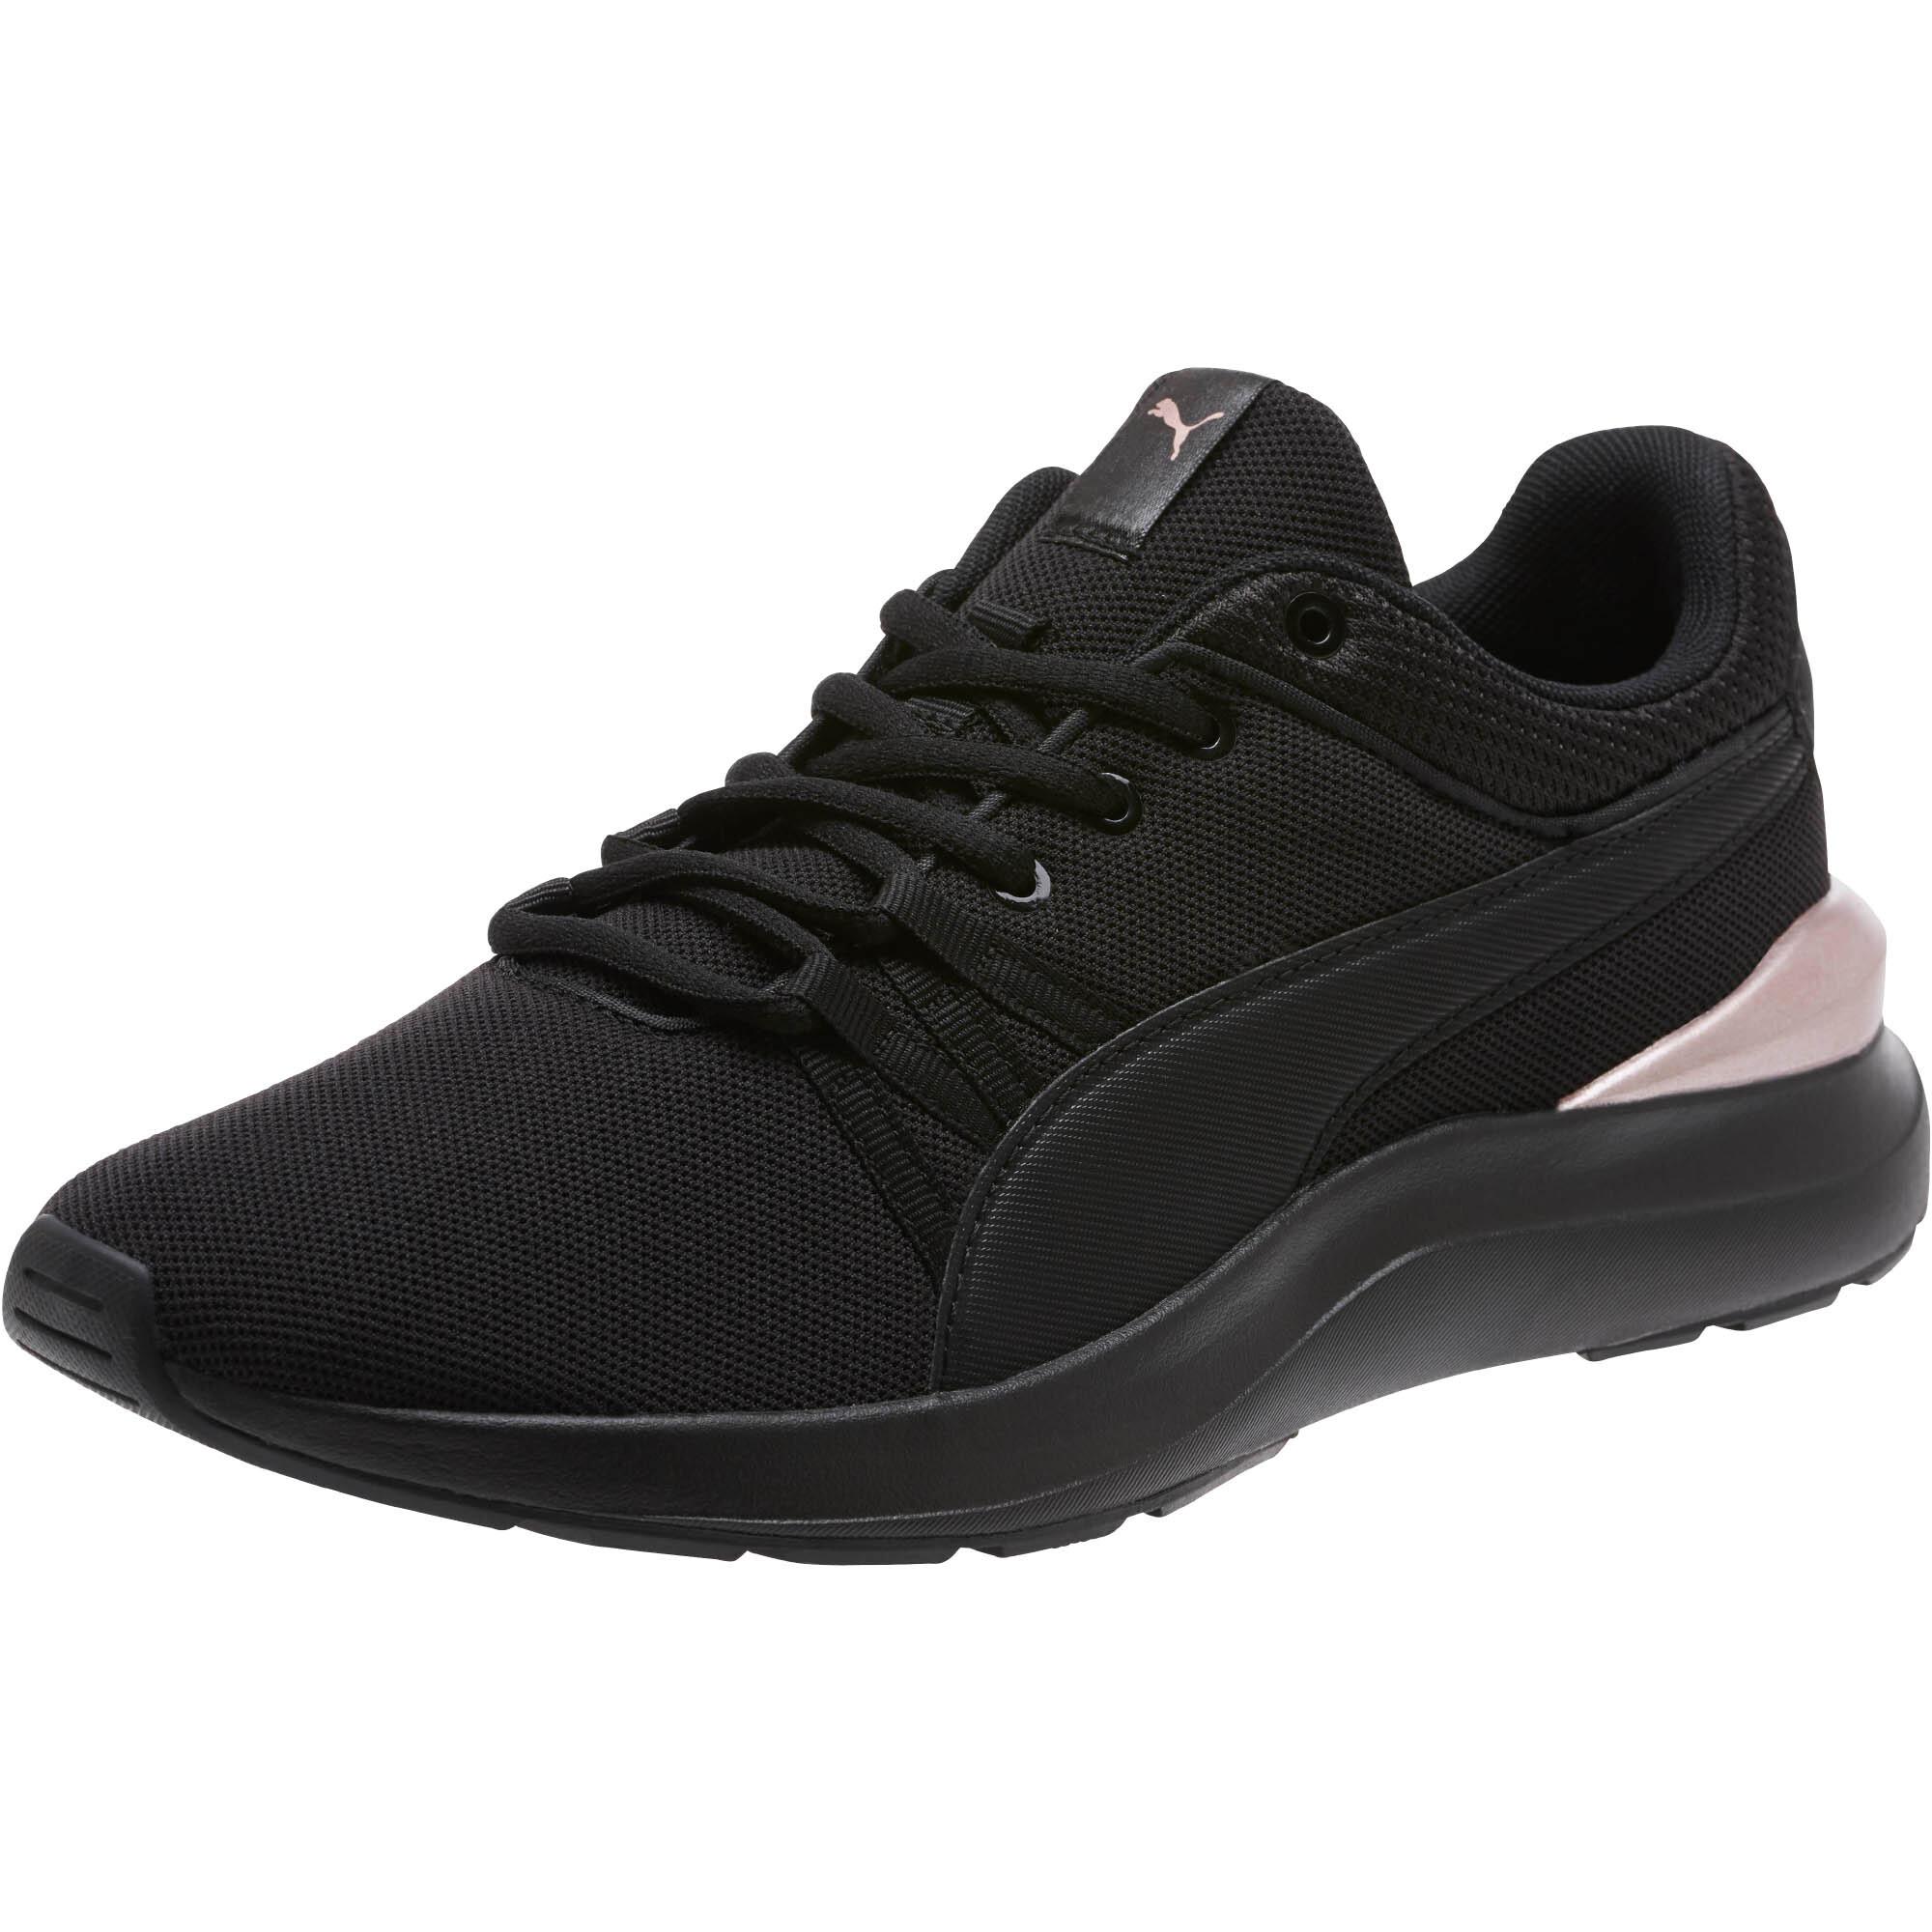 PUMA-Adela-Mesh-Women-s-Sneakers-Women-Shoe-Basics thumbnail 9